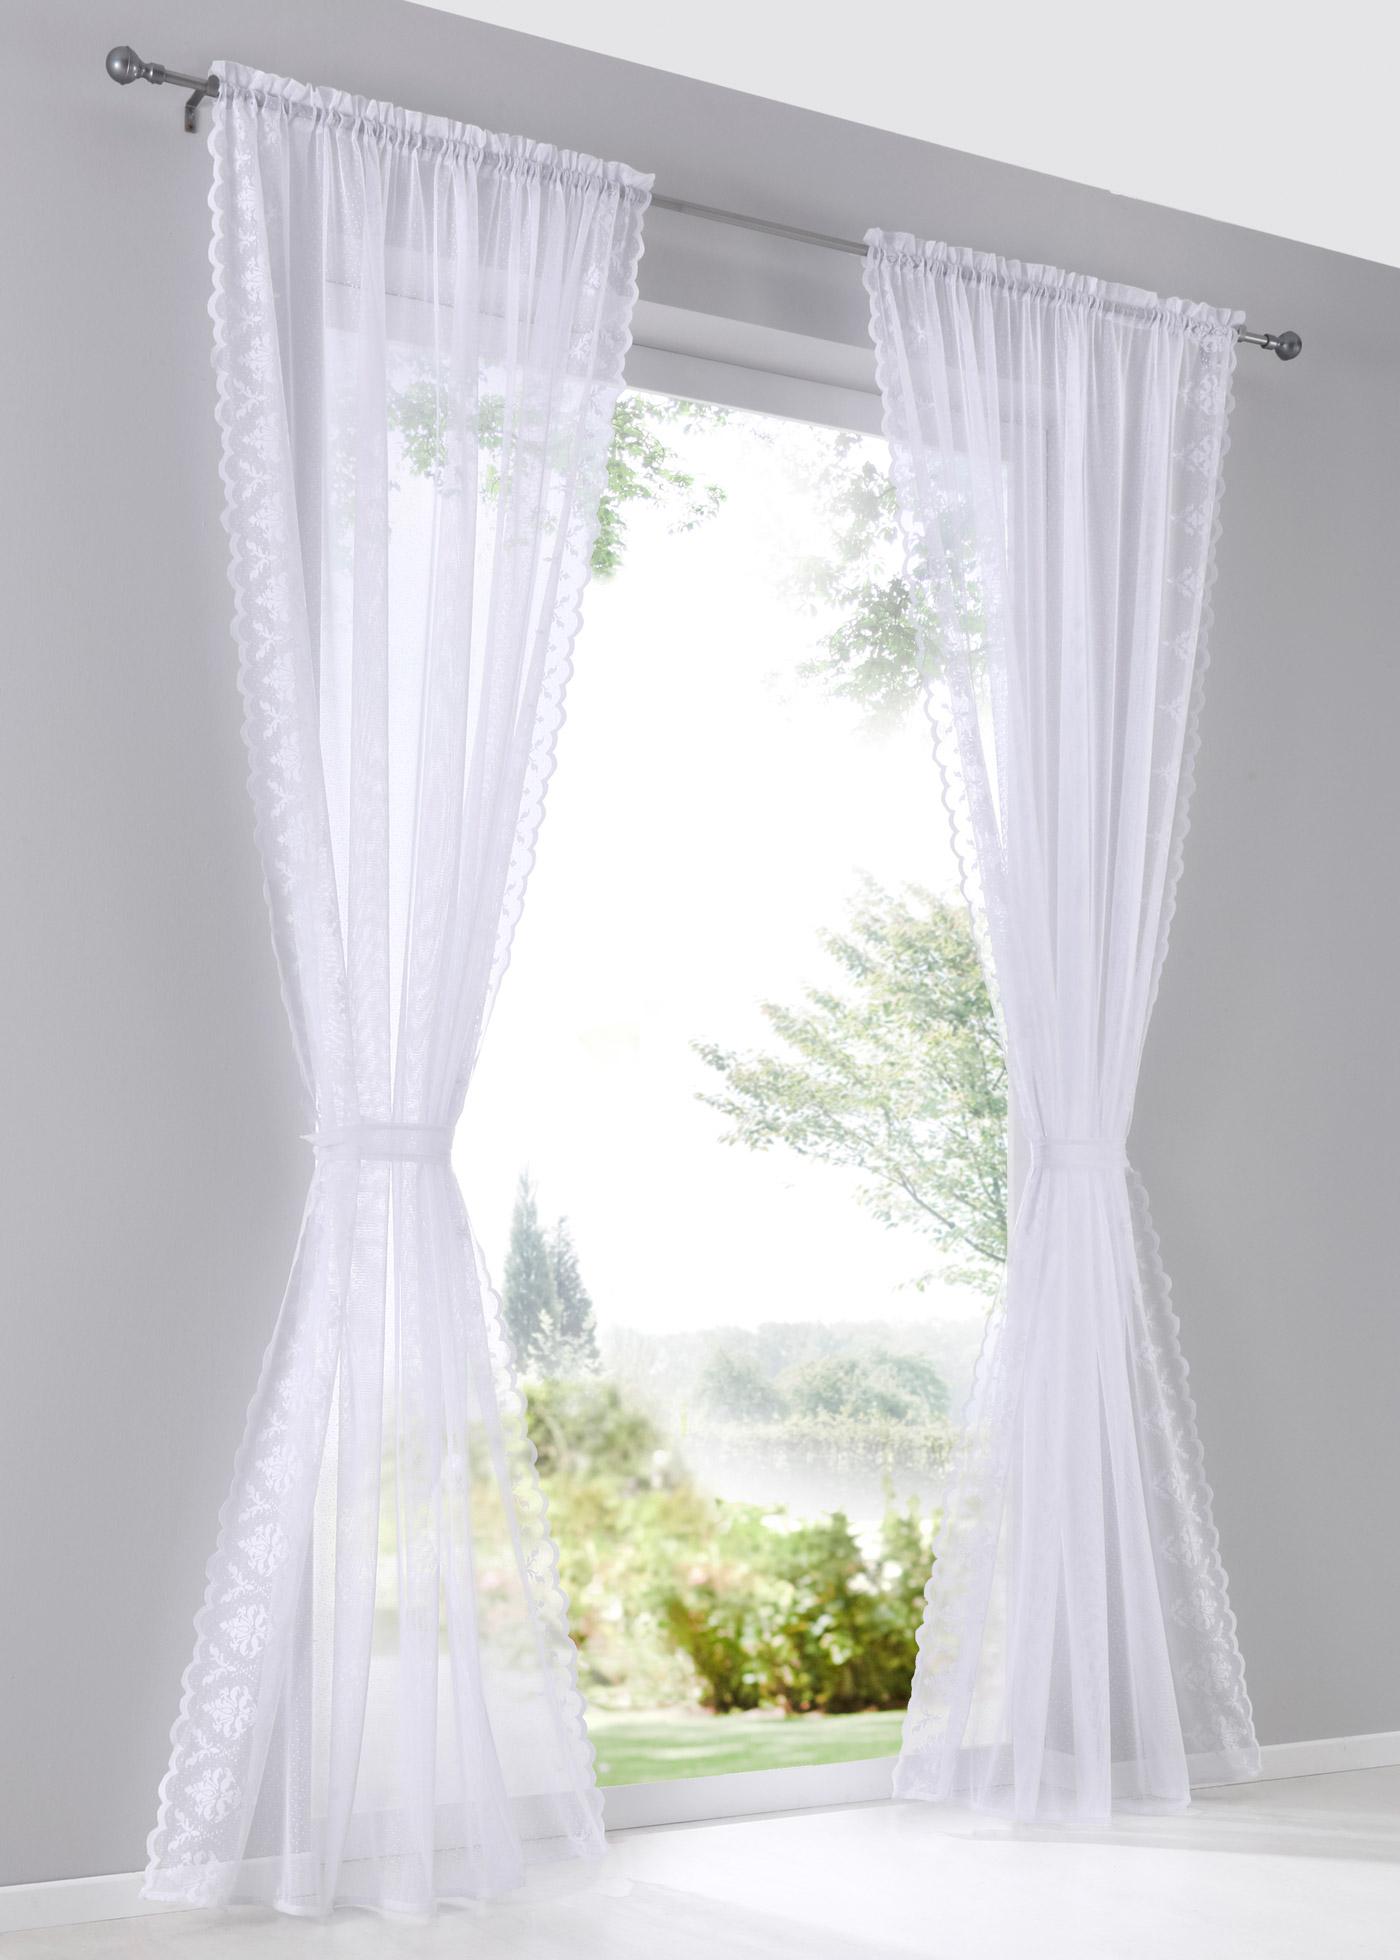 Voilage transparent en tissu jacquard, dimensions = dimensions du tissu.